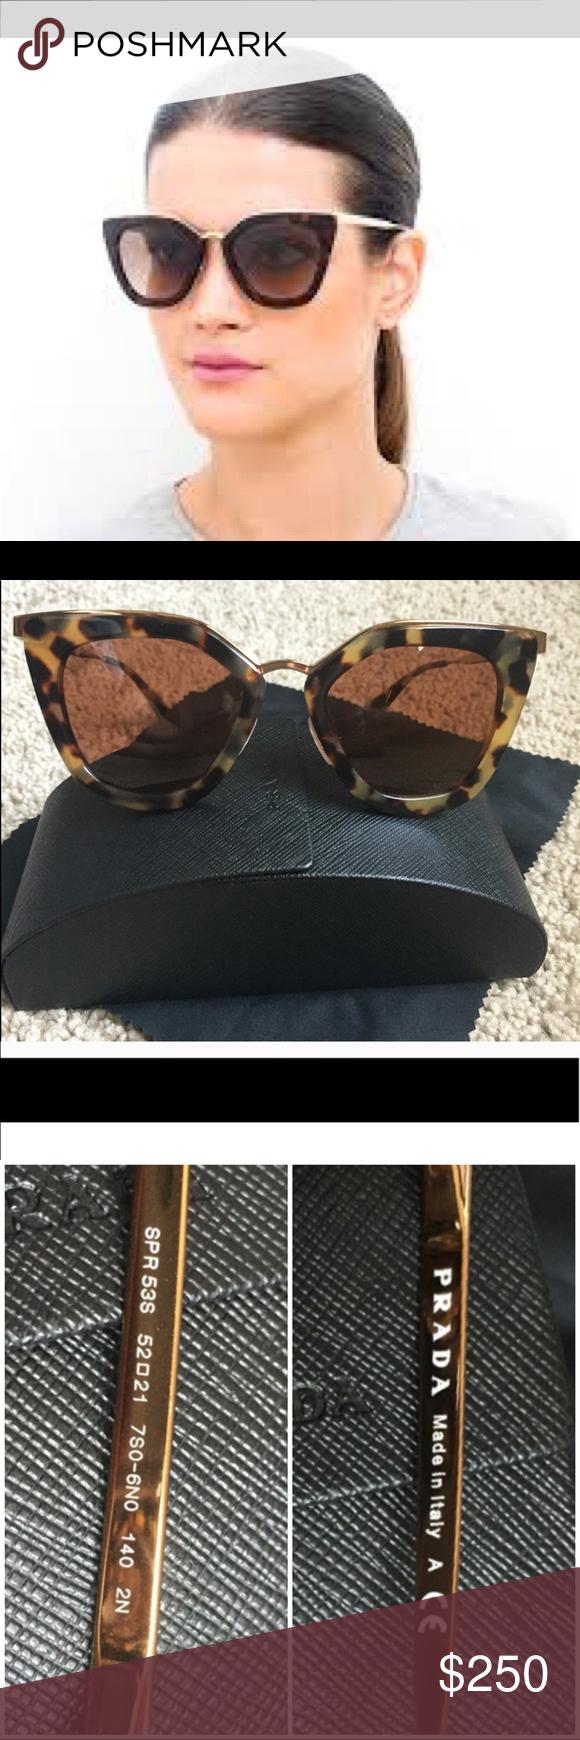 d45b349484 ... inexpensive prada cinema evolution sunglasses prada cinema evolution  sunglasses in tortoise shell. cat eye frame